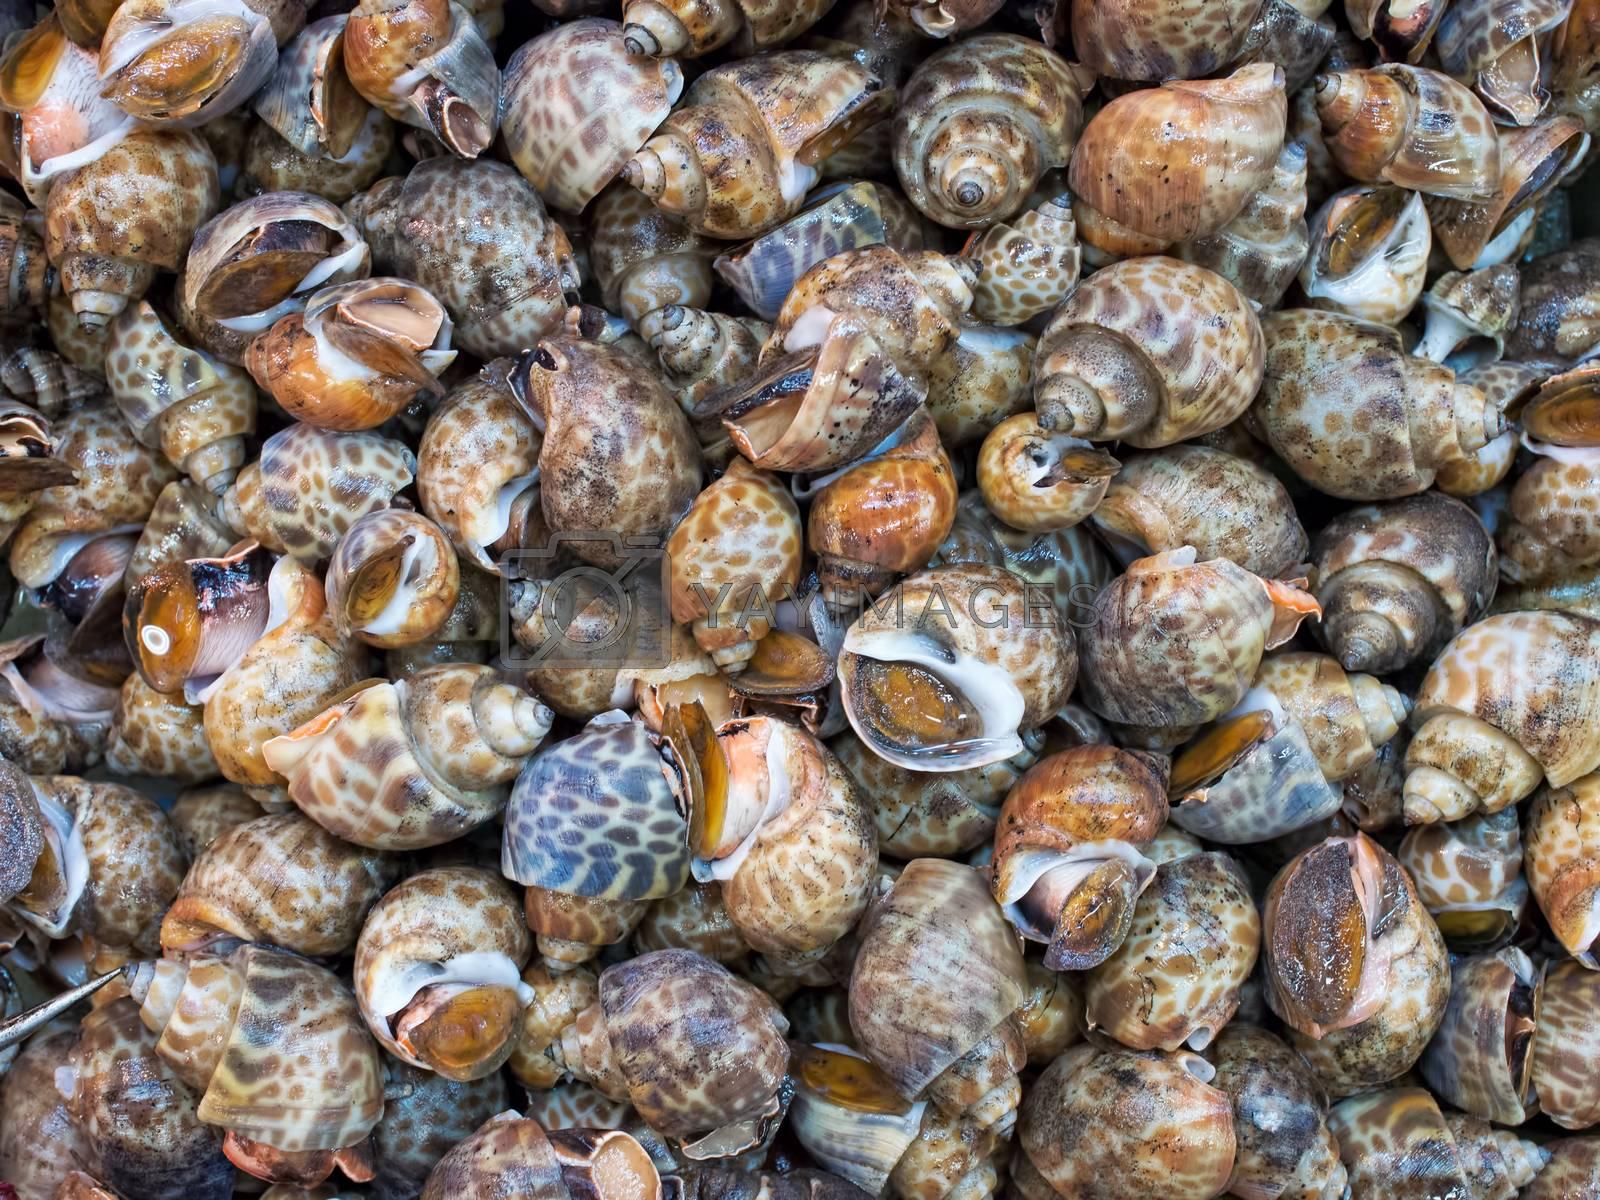 Royalty free image of live sea snails food background by zkruger